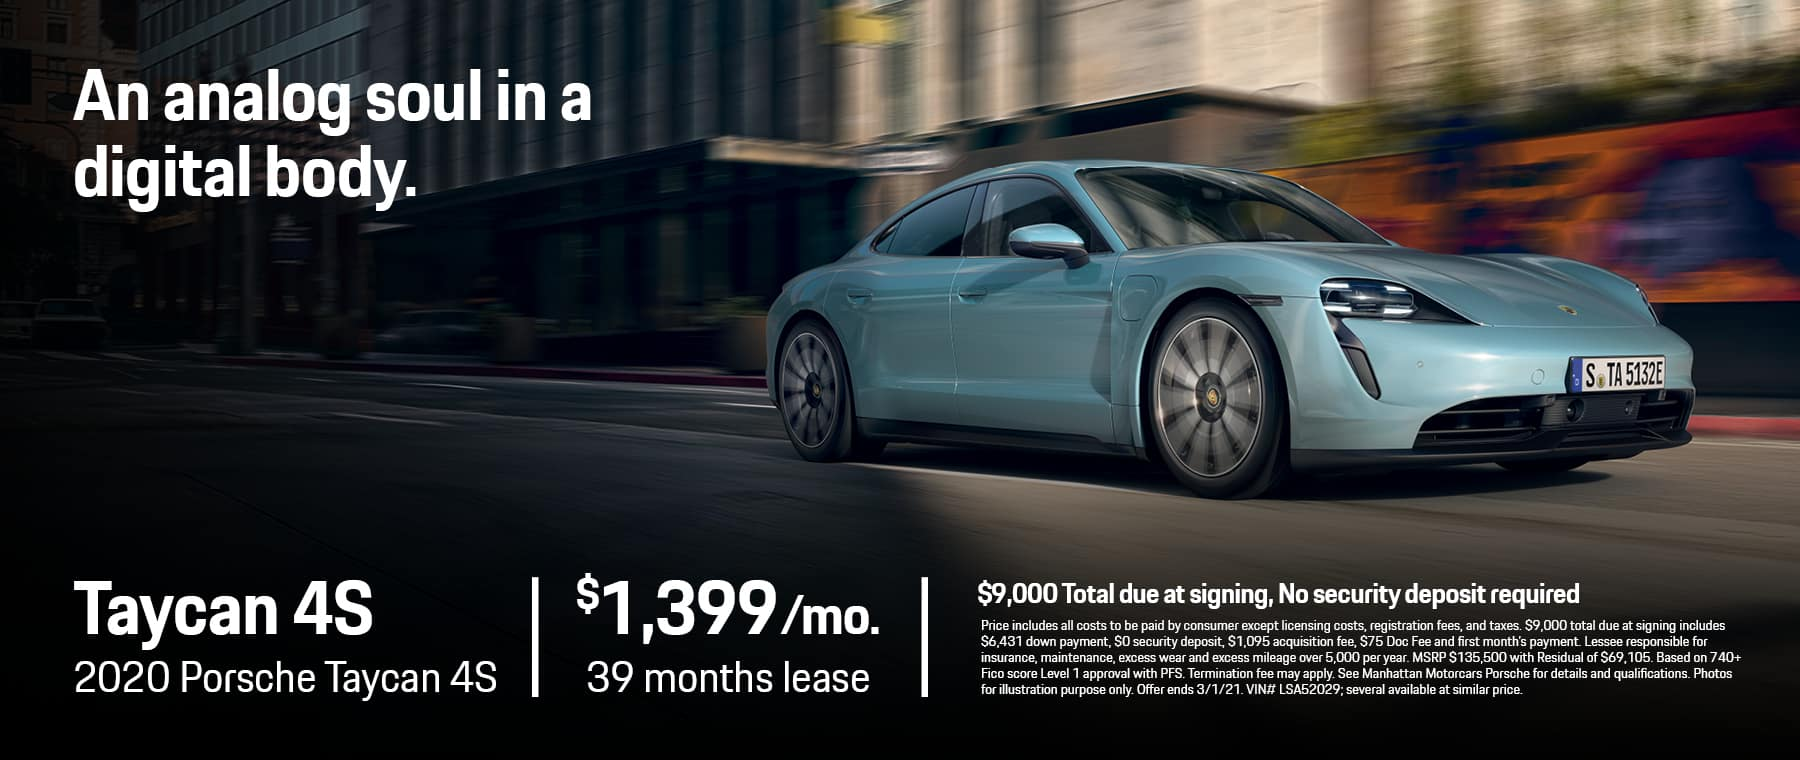 MMC Porsche 1800×760 Feburary 2021 Taycan